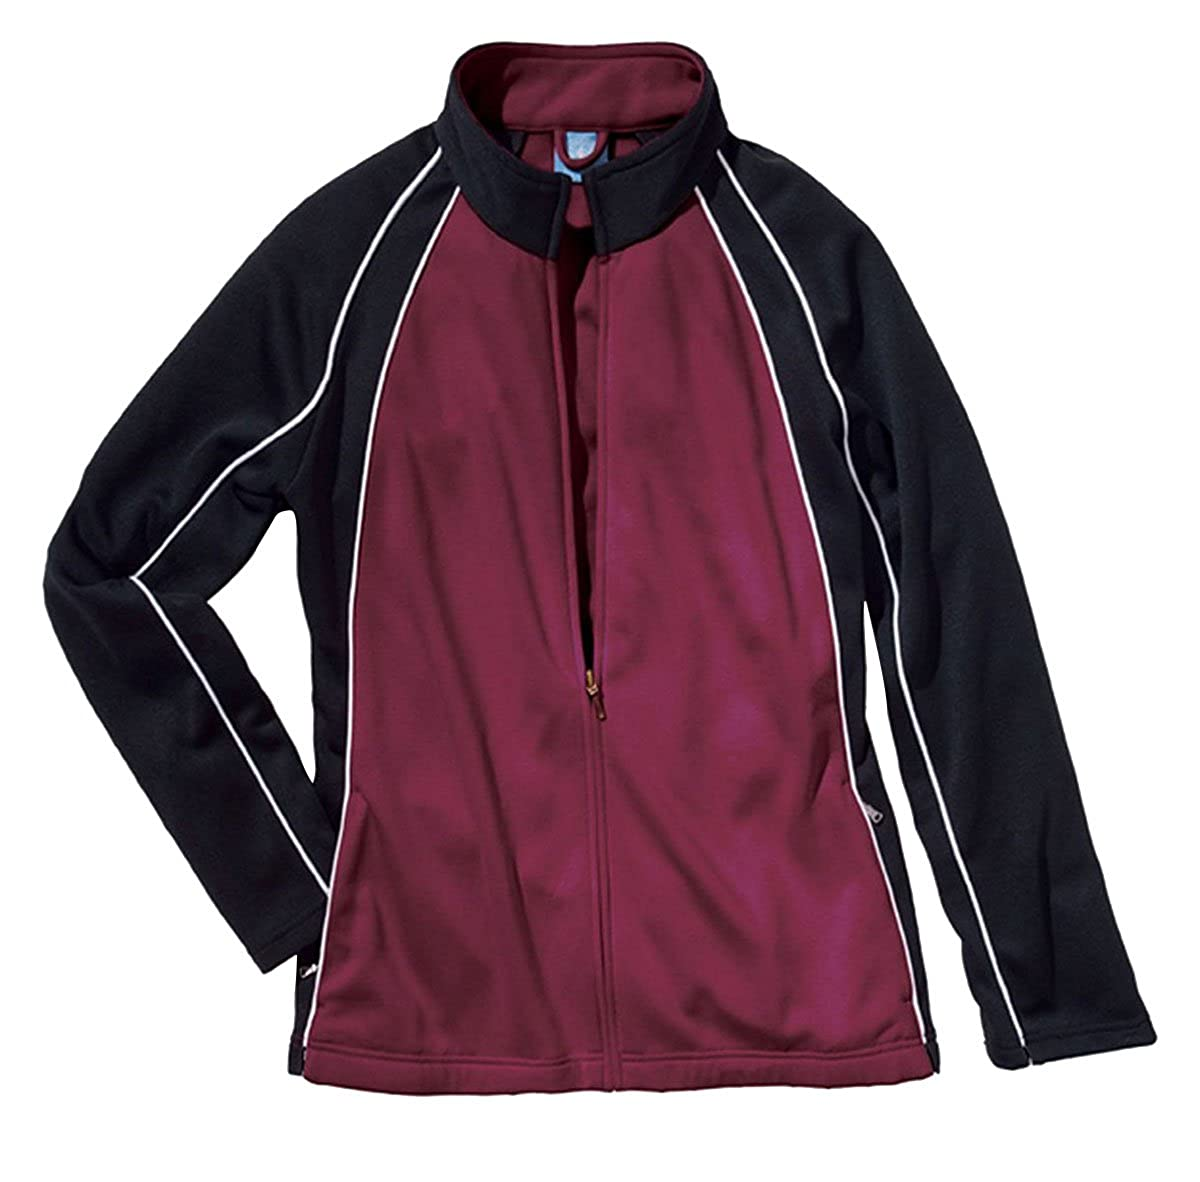 Charles River Apparel Girls Warm Up Olympian Jacket